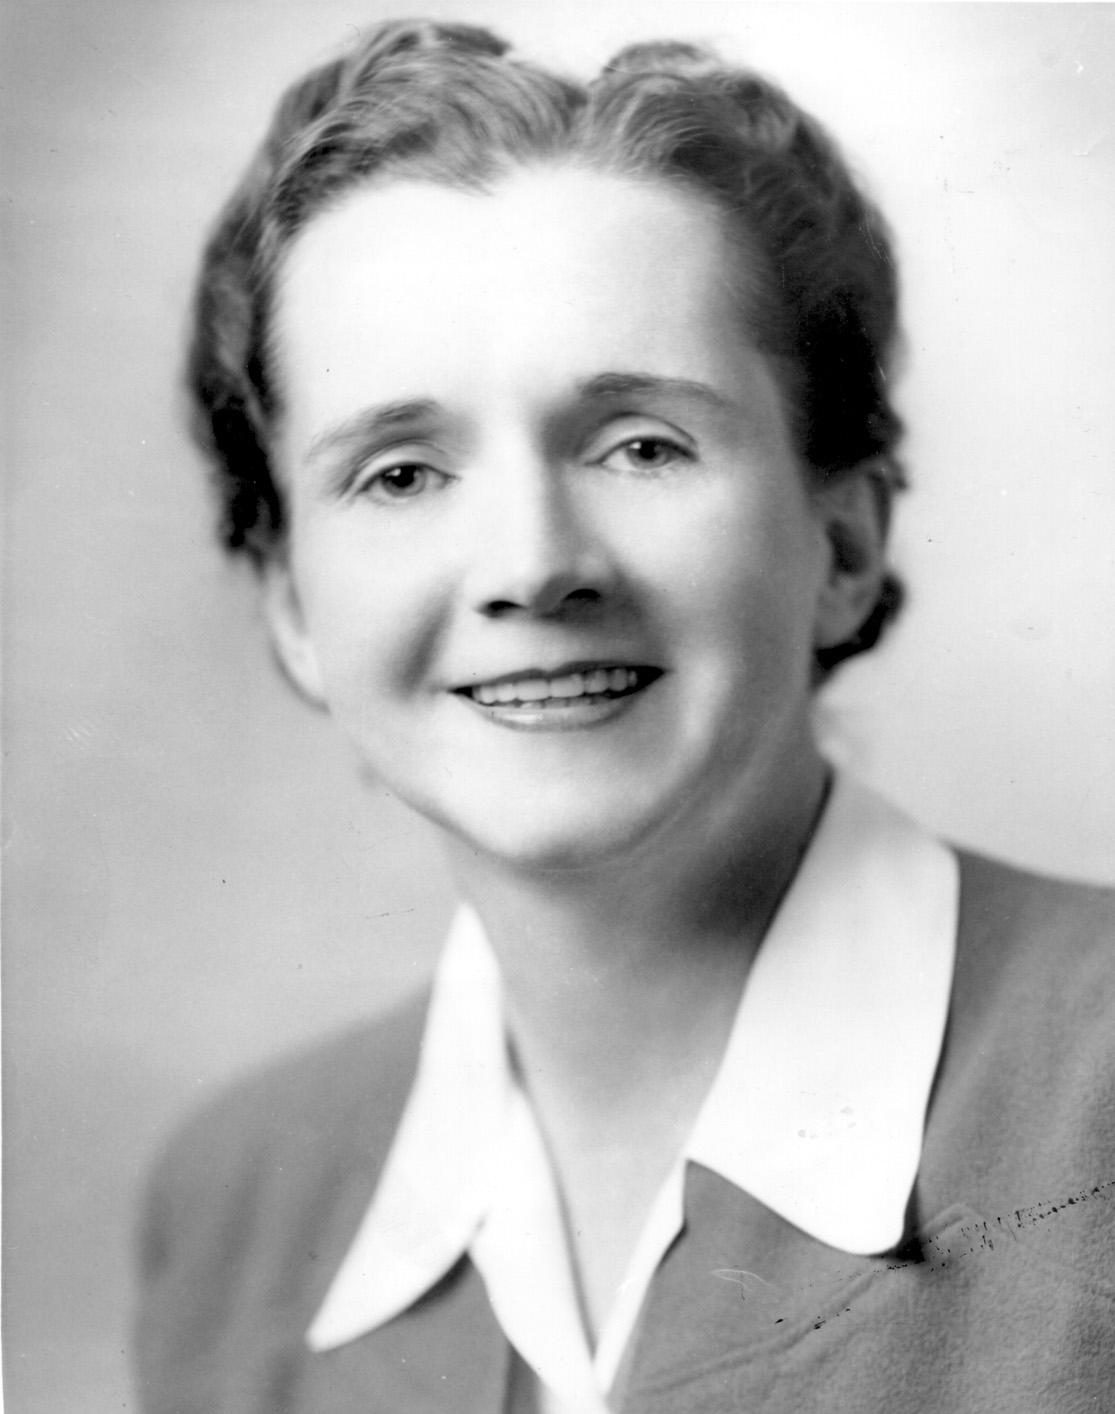 Rachel Carson fws pub domain.jpg